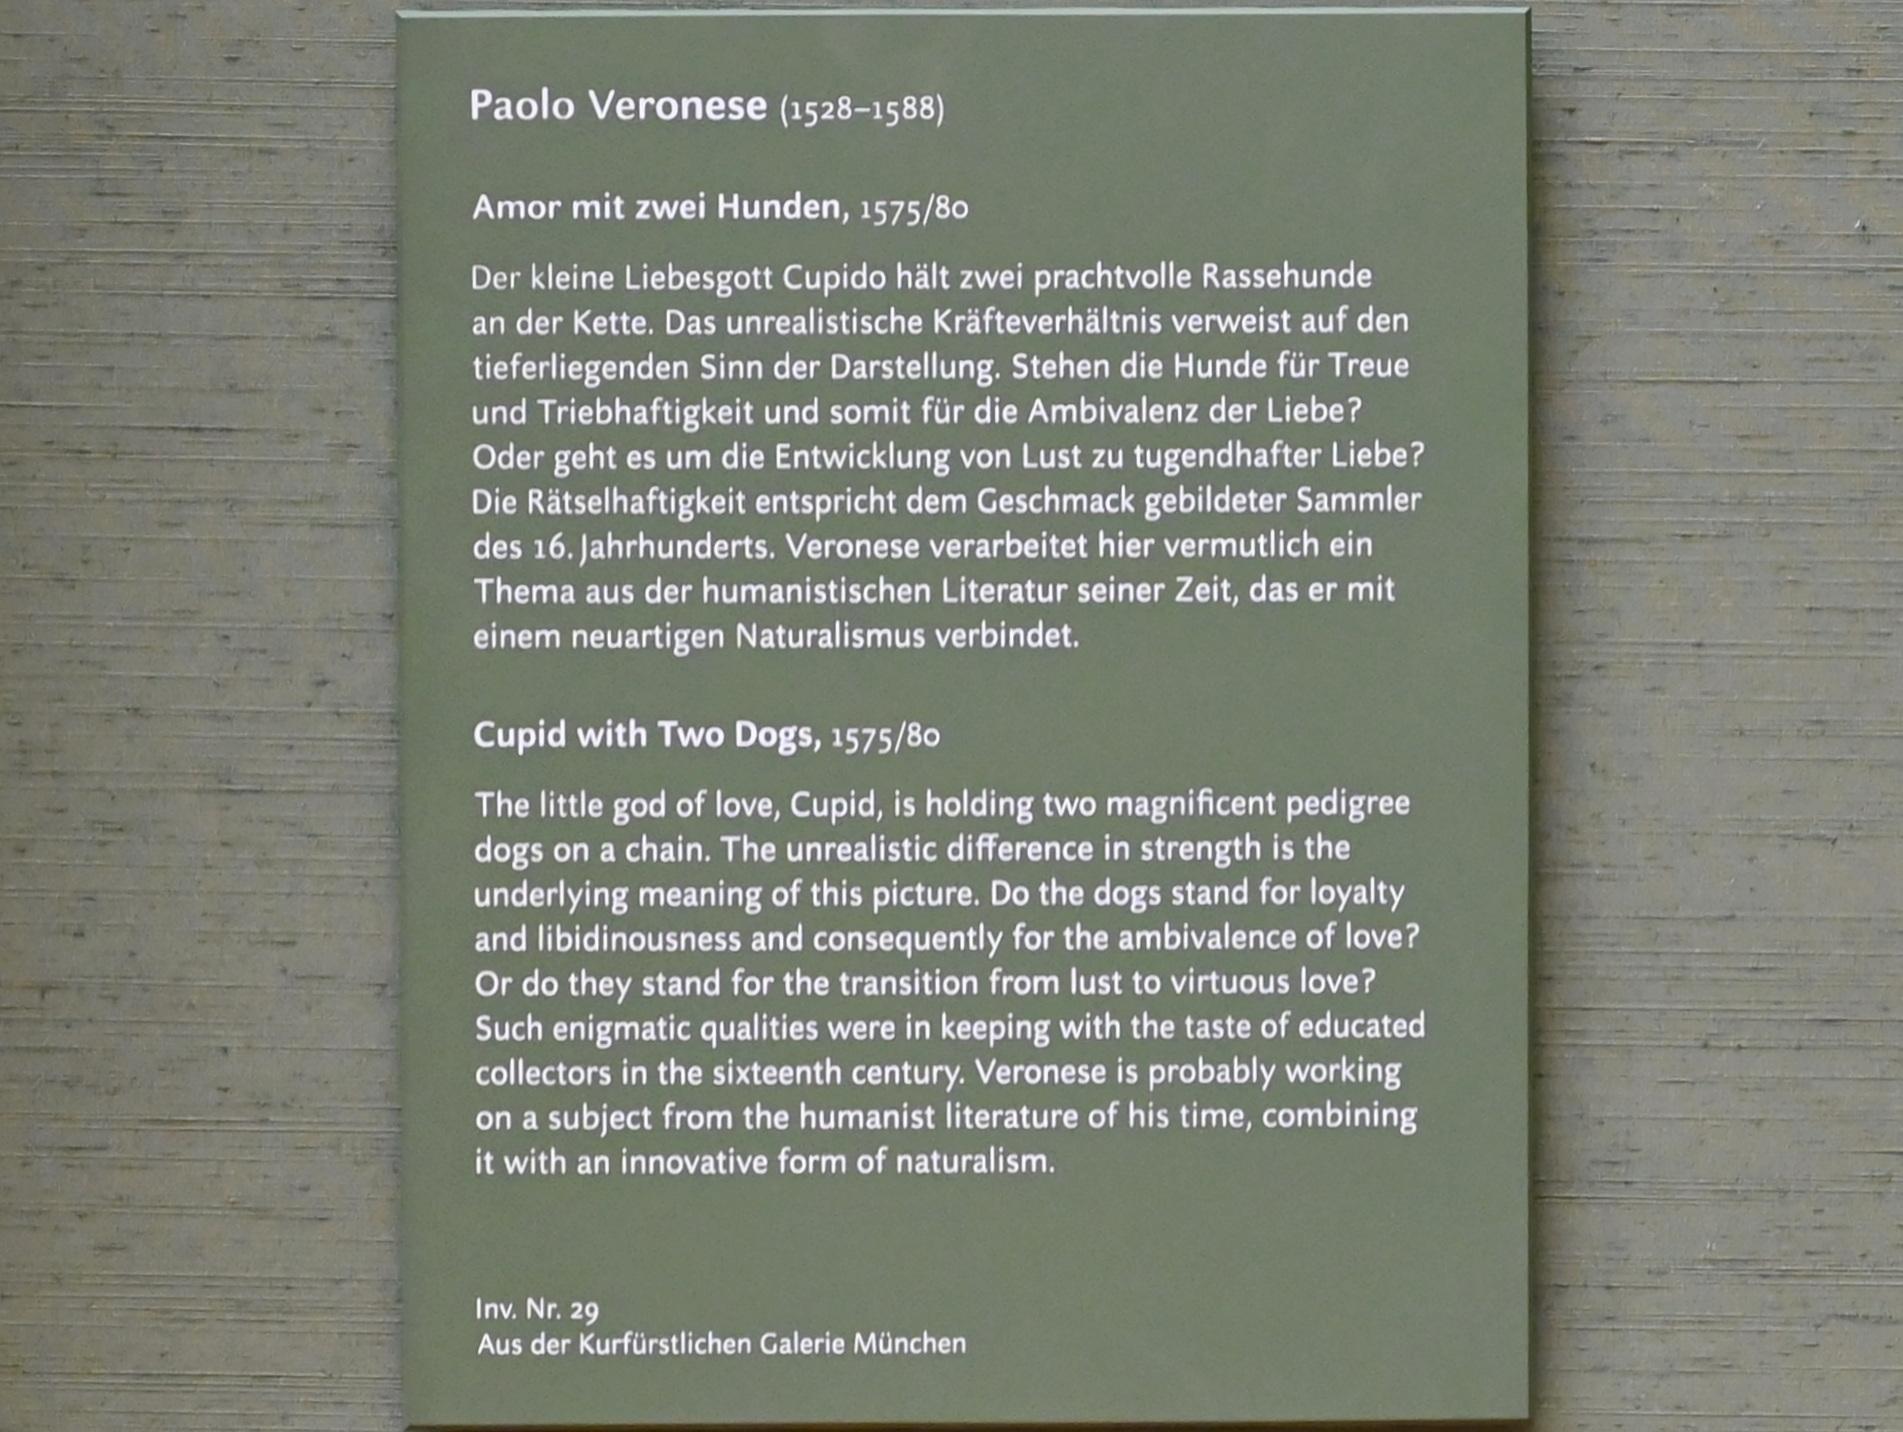 Paolo Caliari (Veronese): Amor mit zwei Hunden, um 1575 - 1580, Bild 2/2